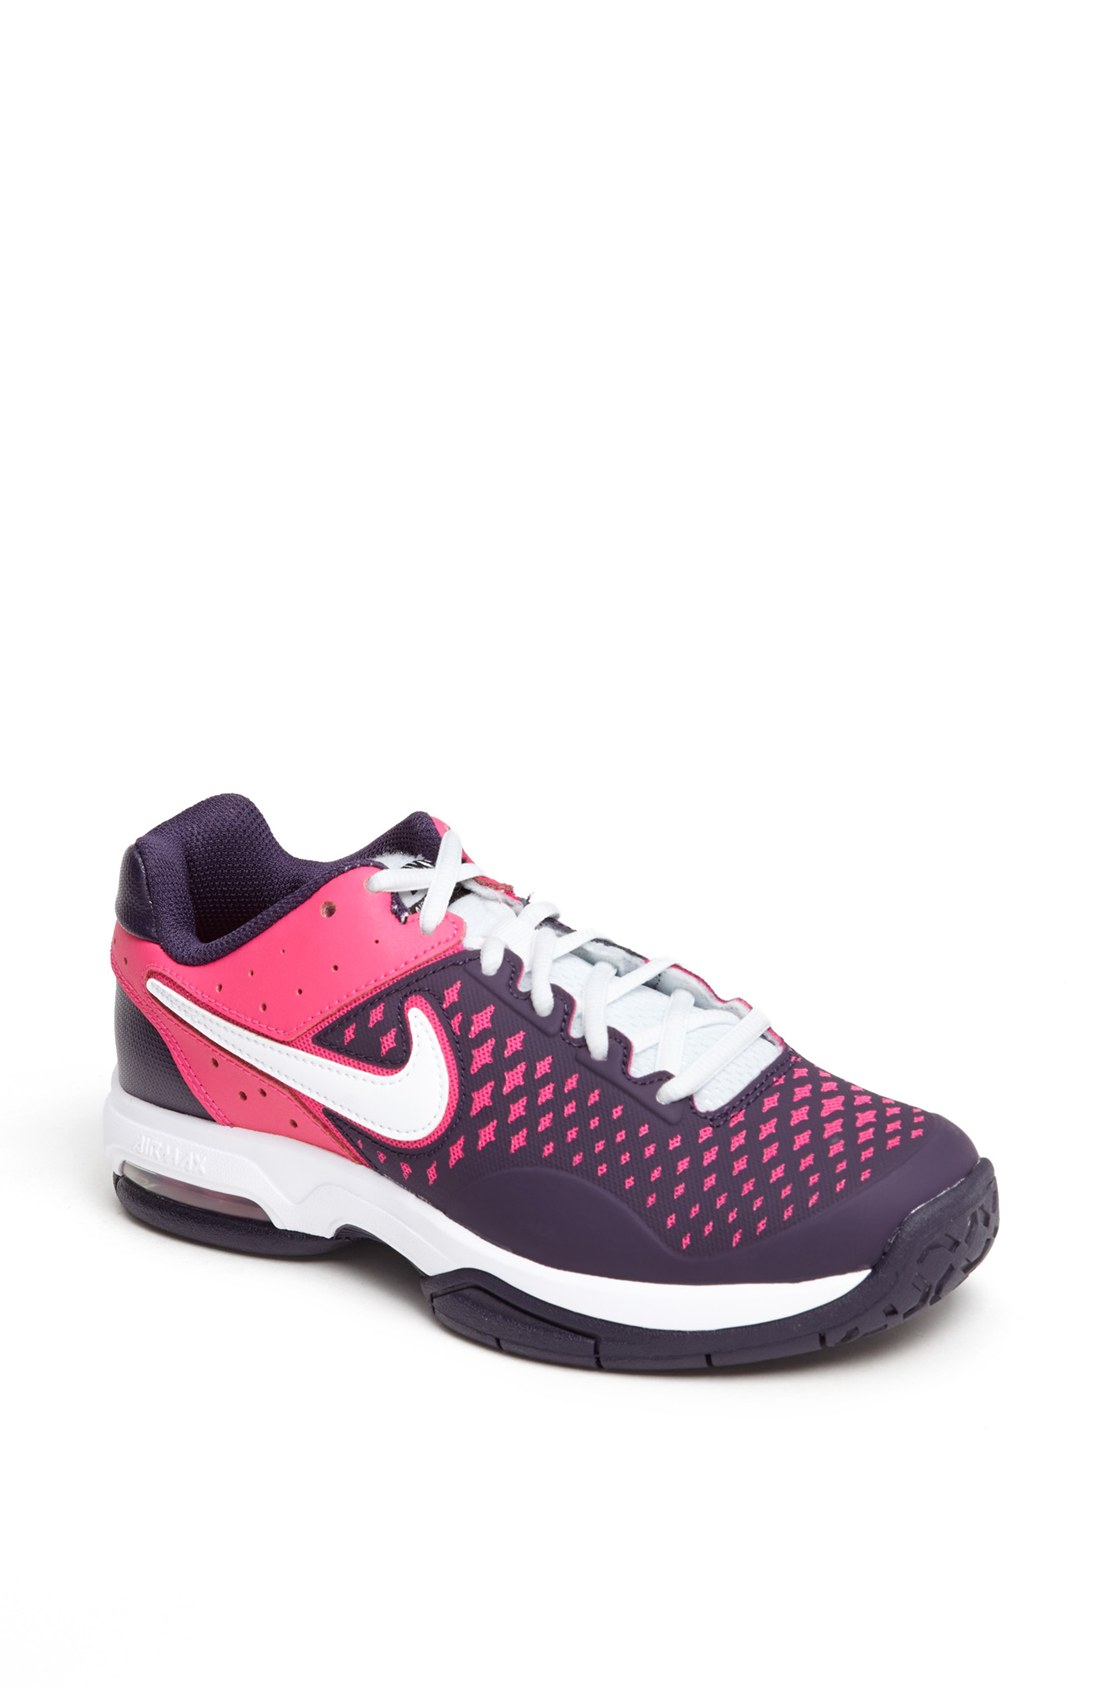 Nike Air Cage Advantage Tennis Shoe in Purple (Purple ...